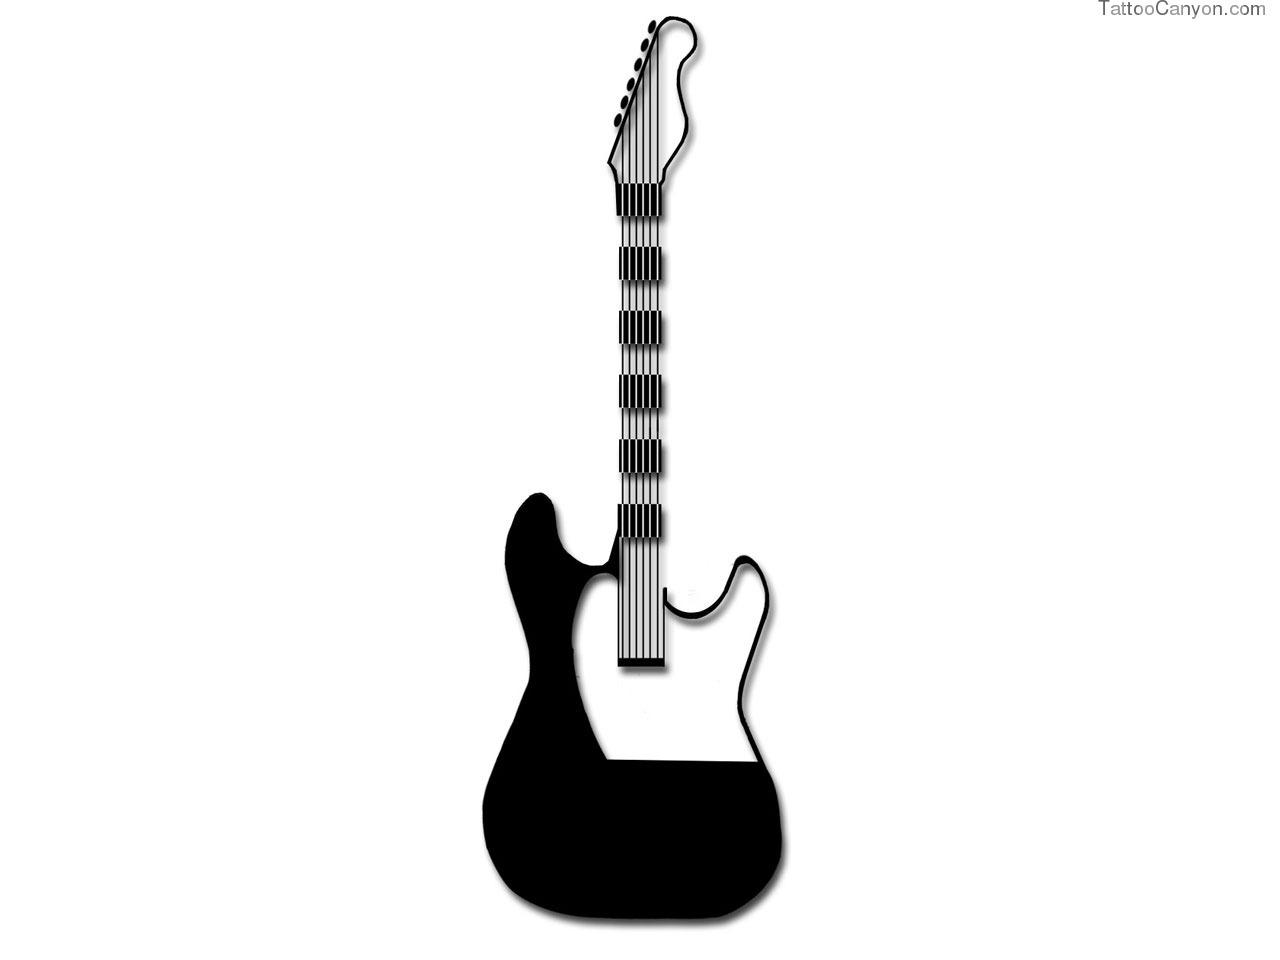 Music Guitar Tattoo Design